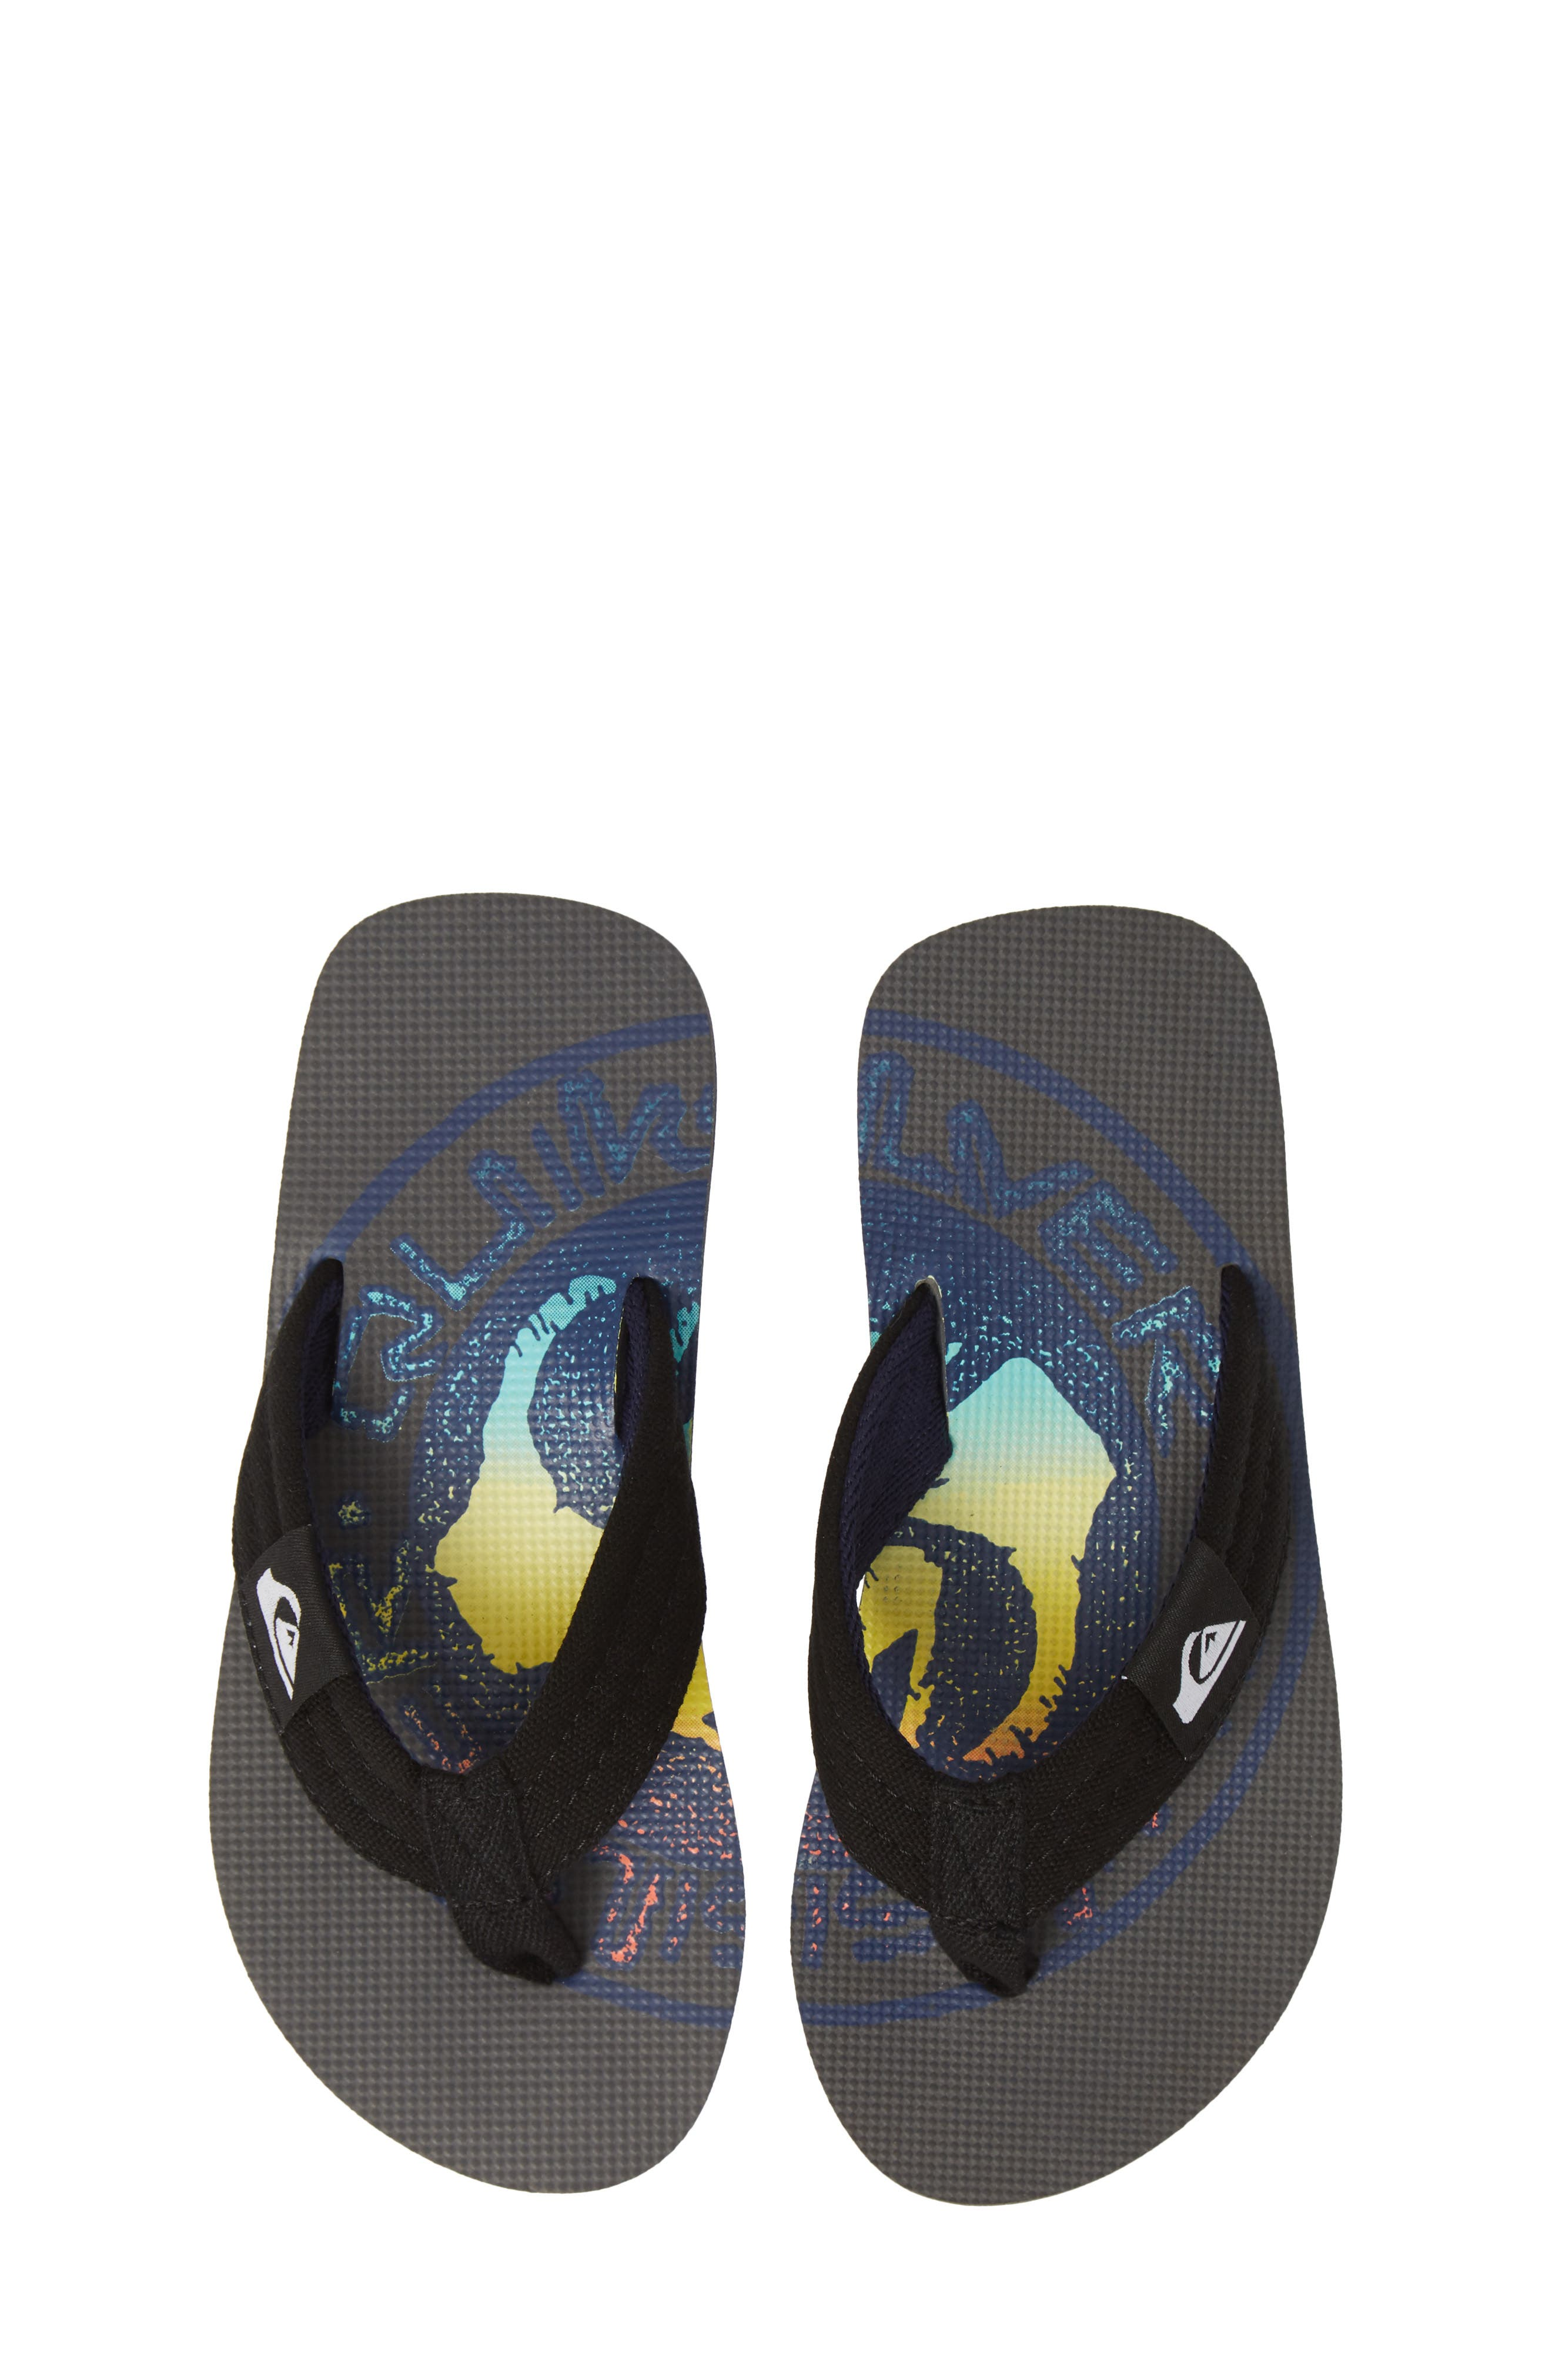 QUIKSILVER, Molokai Layback Flip Flop, Main thumbnail 1, color, GREY/ BLACK/ BLUE